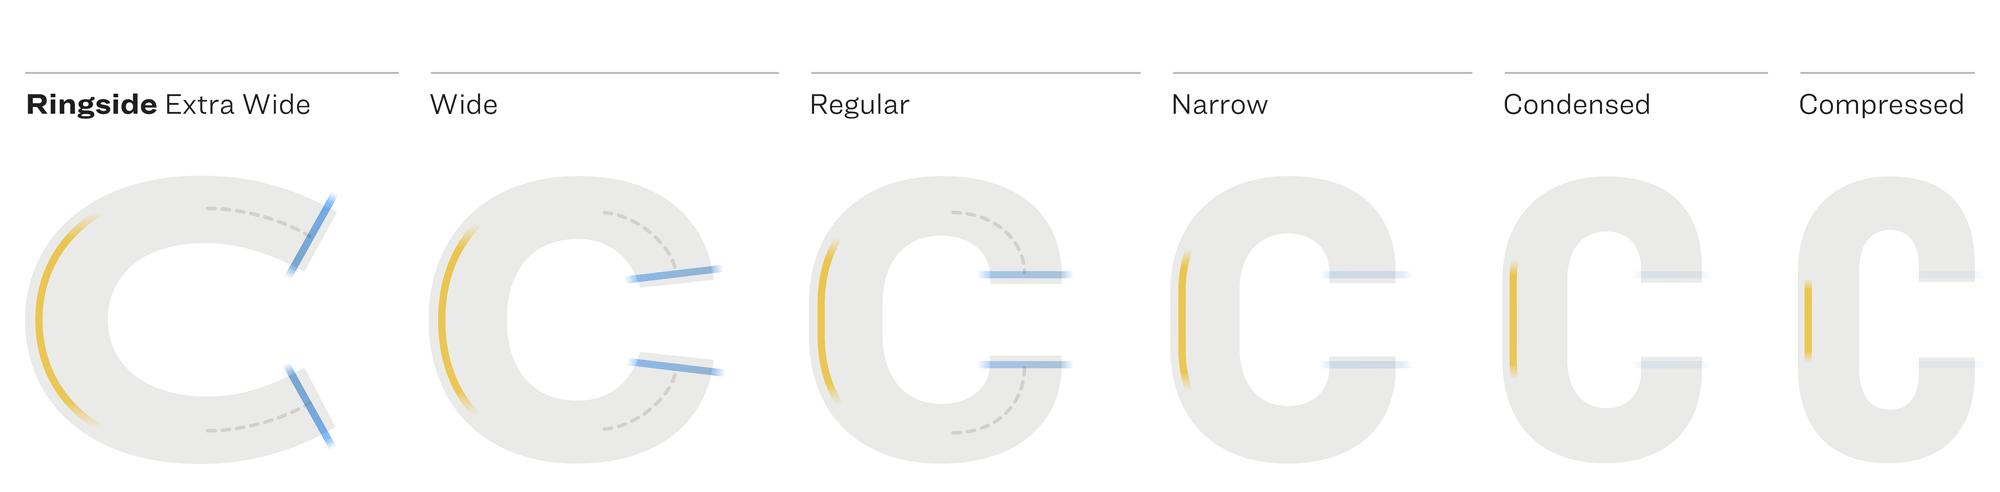 Meet Ringside, a new sans serif from Hoefler & Co.